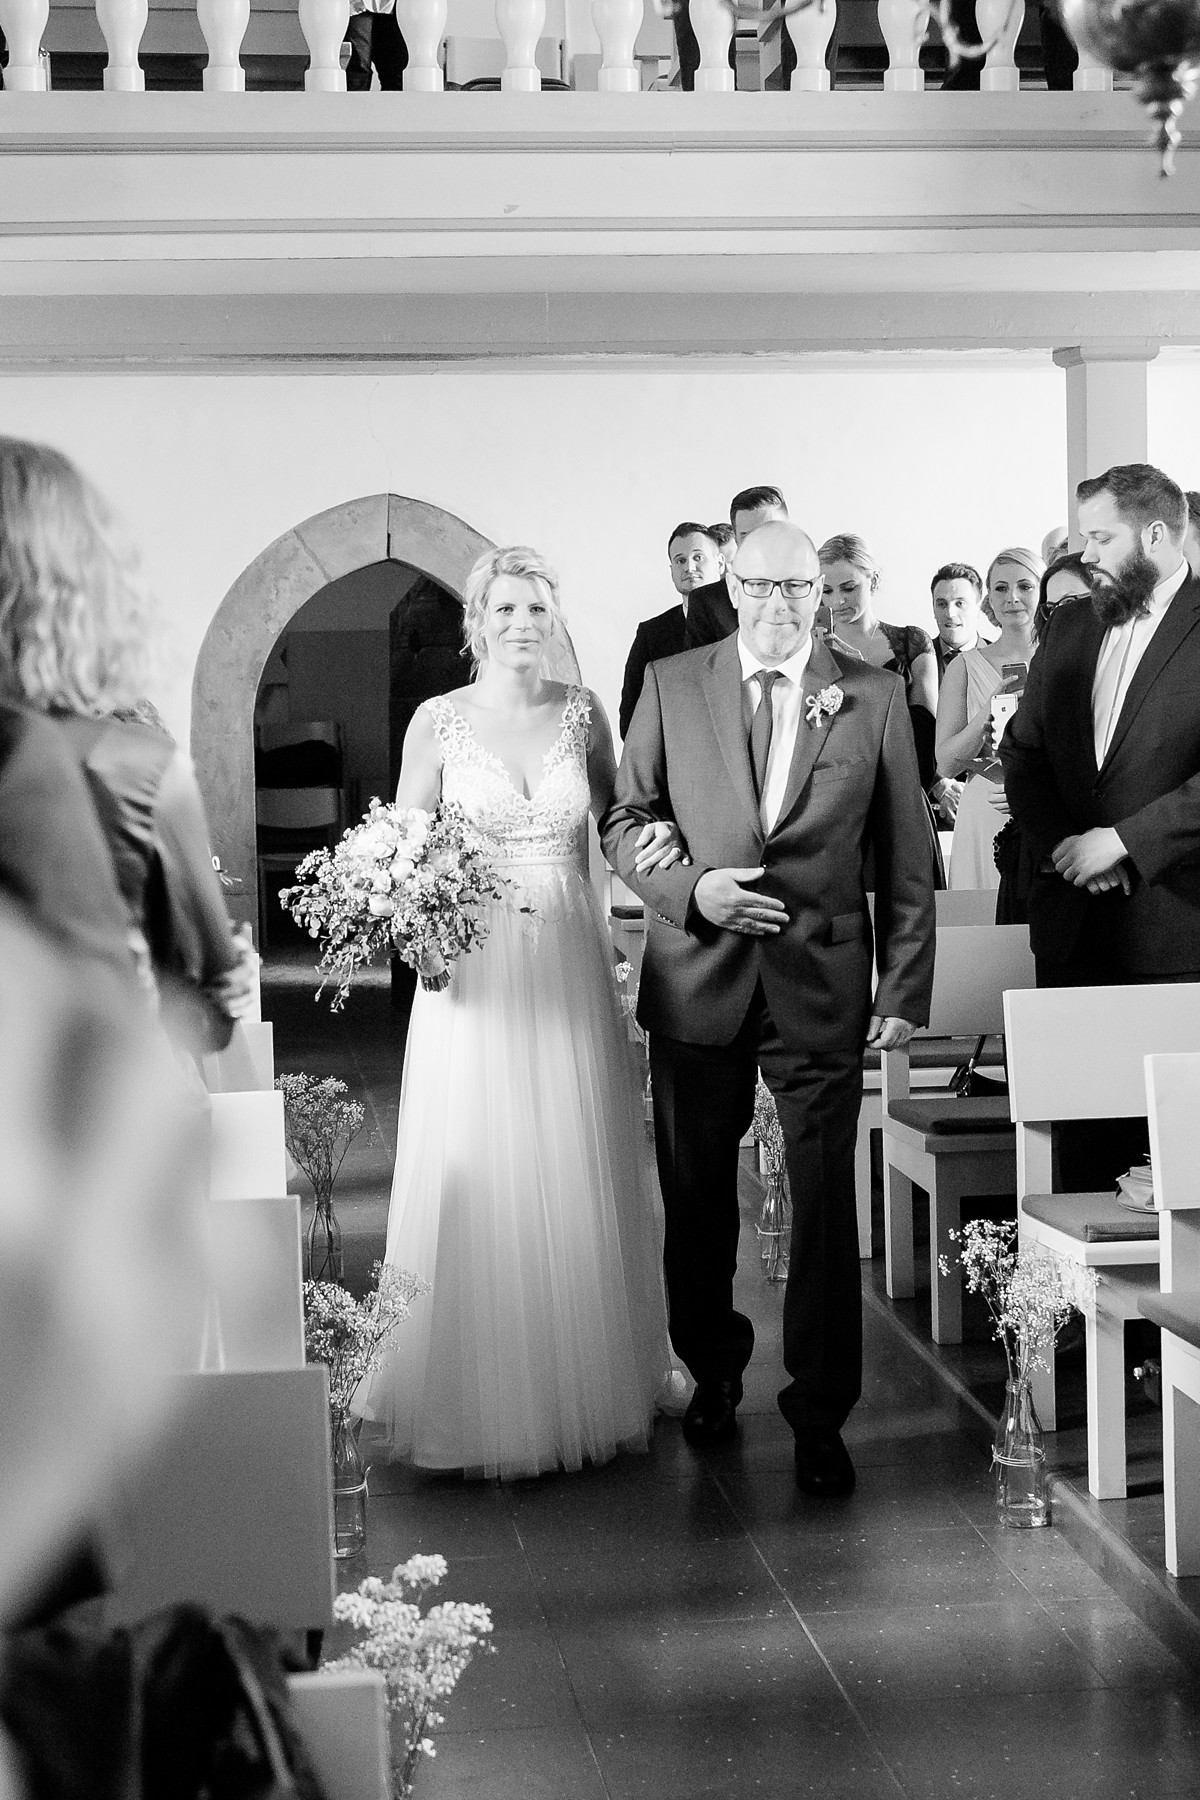 Hochzeitsfotograf-Hildesheim-Hannover-Fotograf_0080